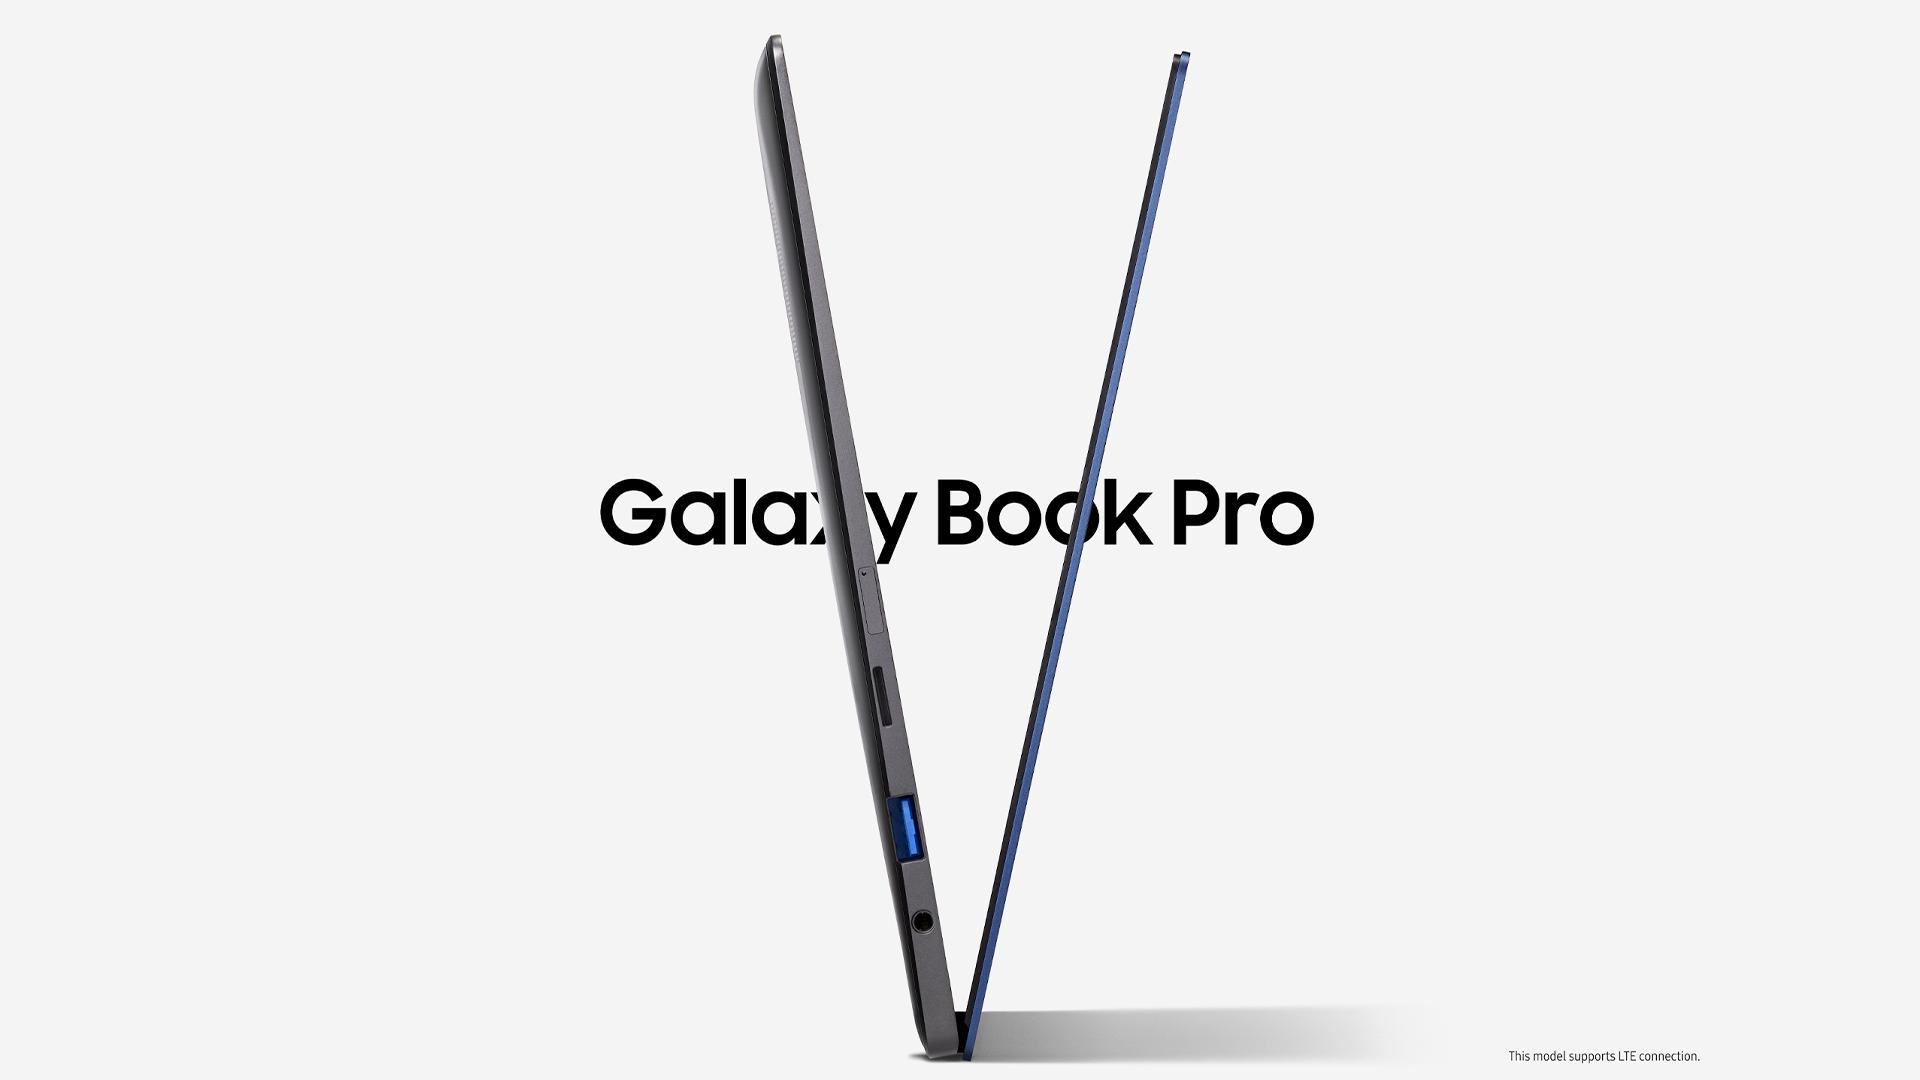 The Samsung Galaxy Book Pro